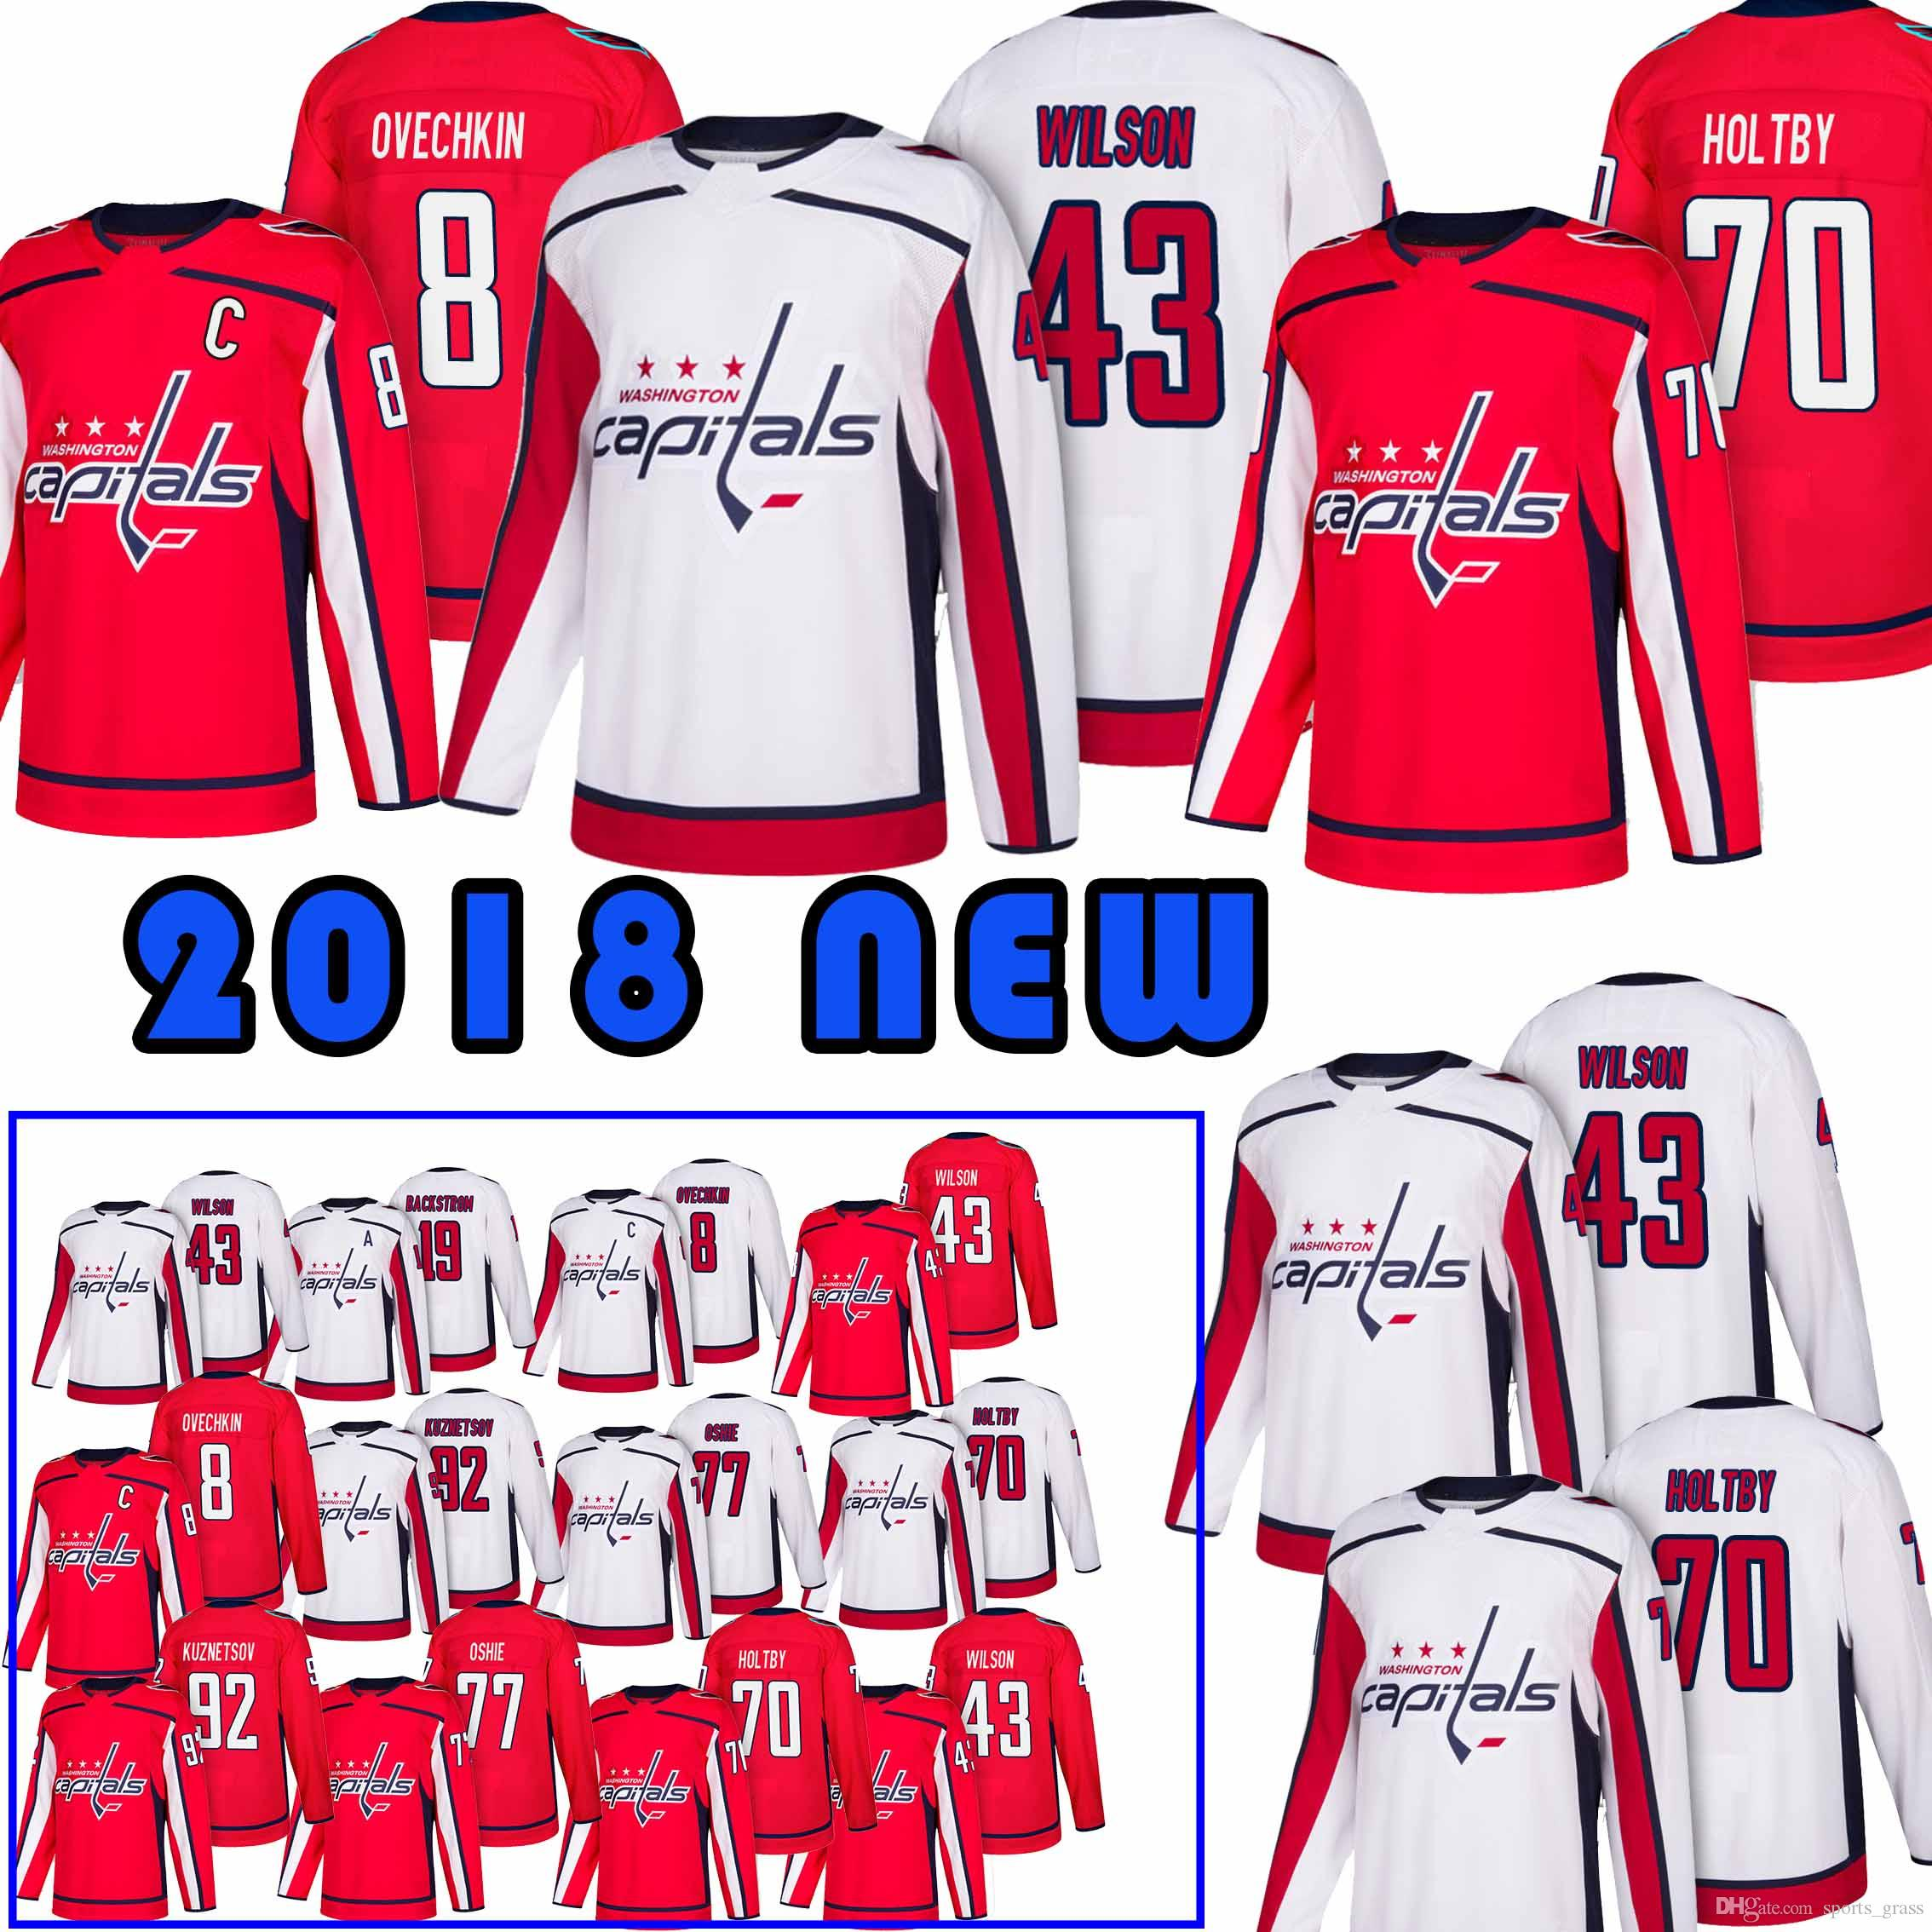 check out 065c3 664d8 Washington Capitals Jerseys 8 Alex Ovechkin 77 T.J. Oshie 19 Nicklas 70  Braden Holtby 43 Tom Hockey Jersey Top quality